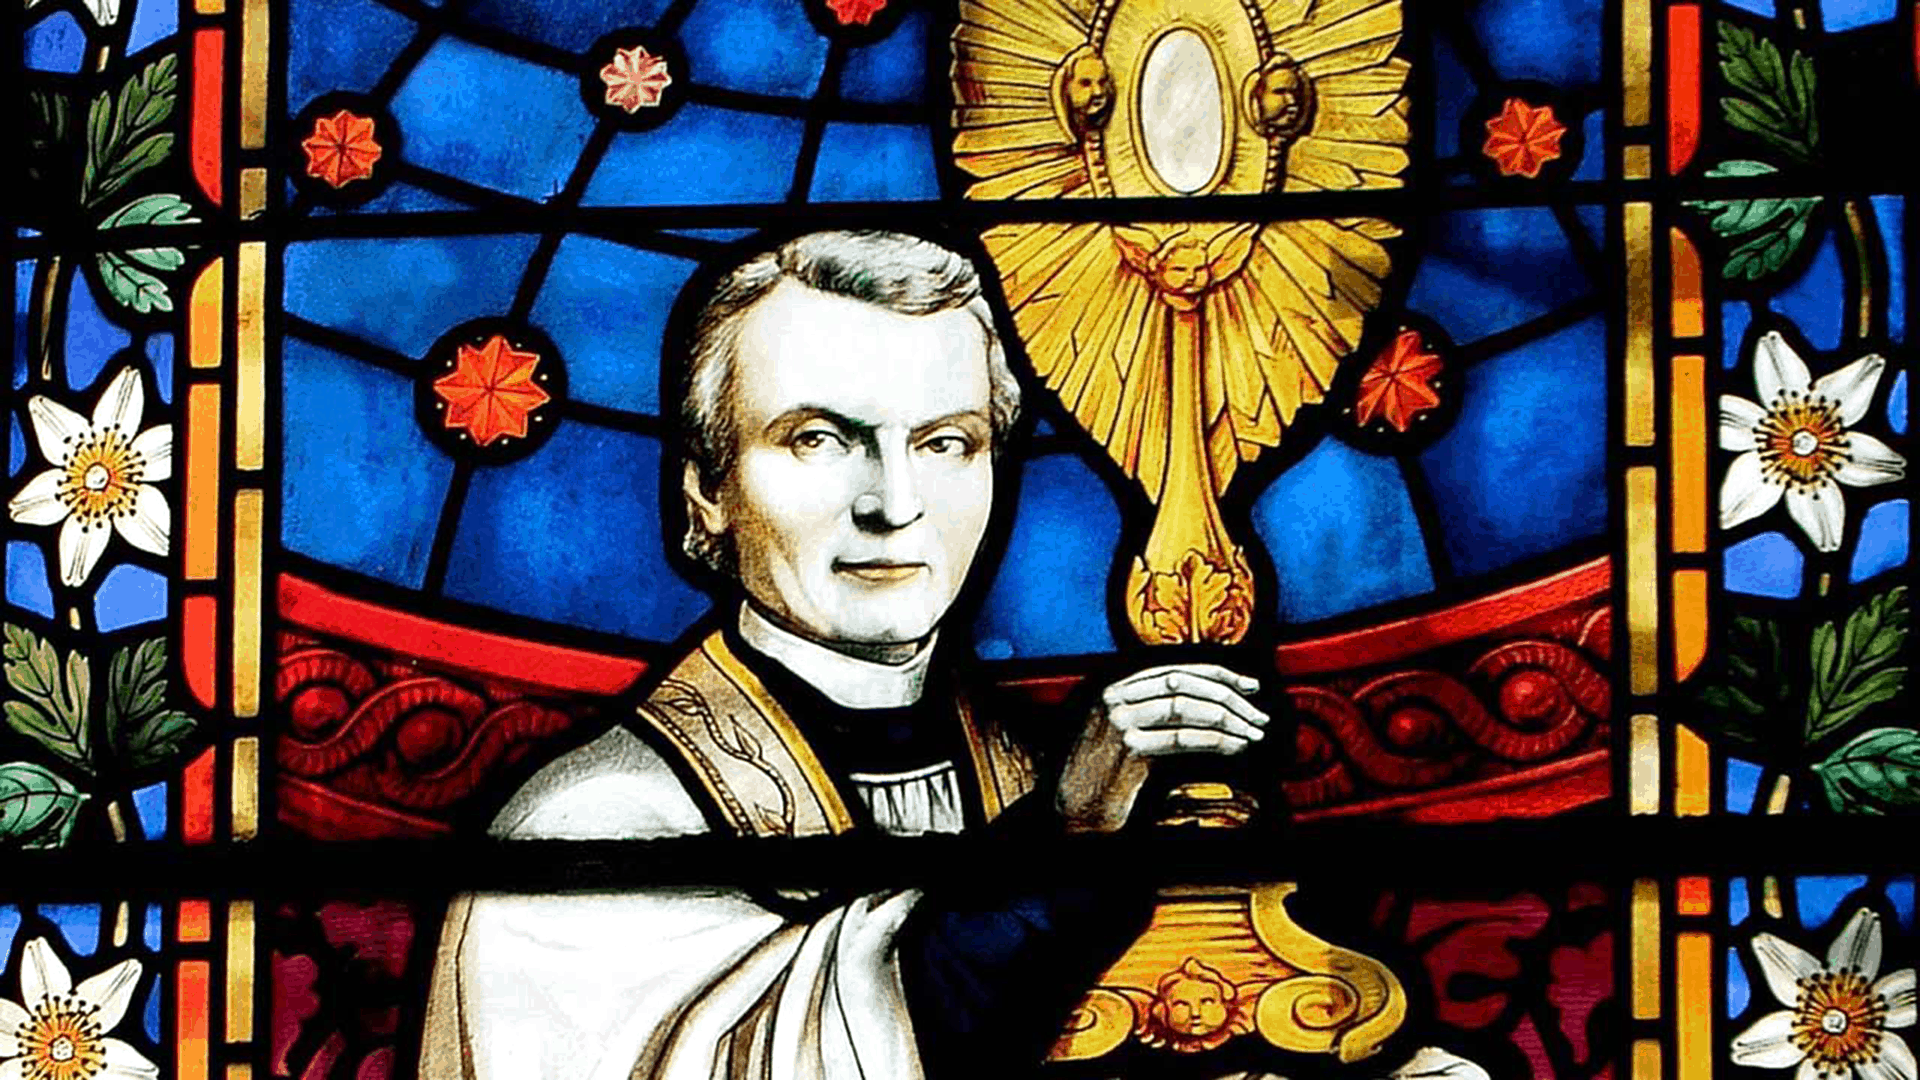 heilige-pierre-julien-eymard-sacramentijnen-olv-ter-nood-heiloo